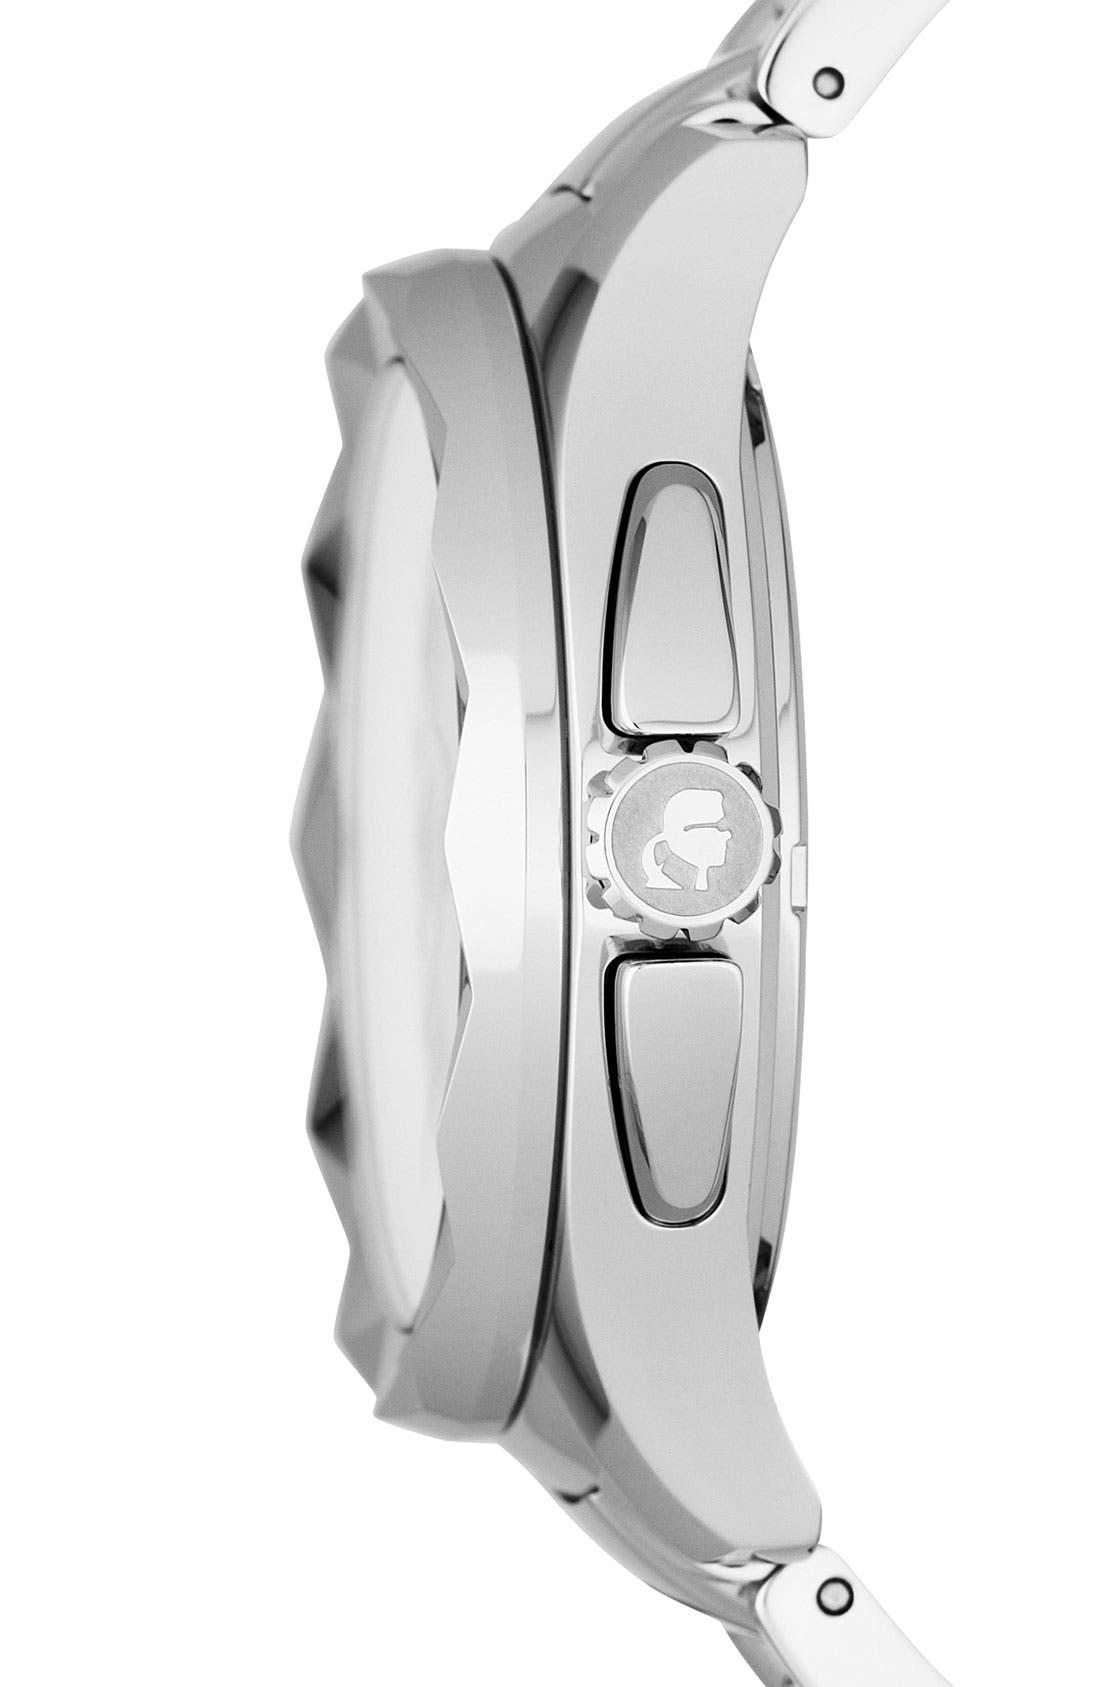 Alternate Image 3  - KARL LAGERFELD '7' Faceted Bezel Bracelet Watch, 44mm x 53mm